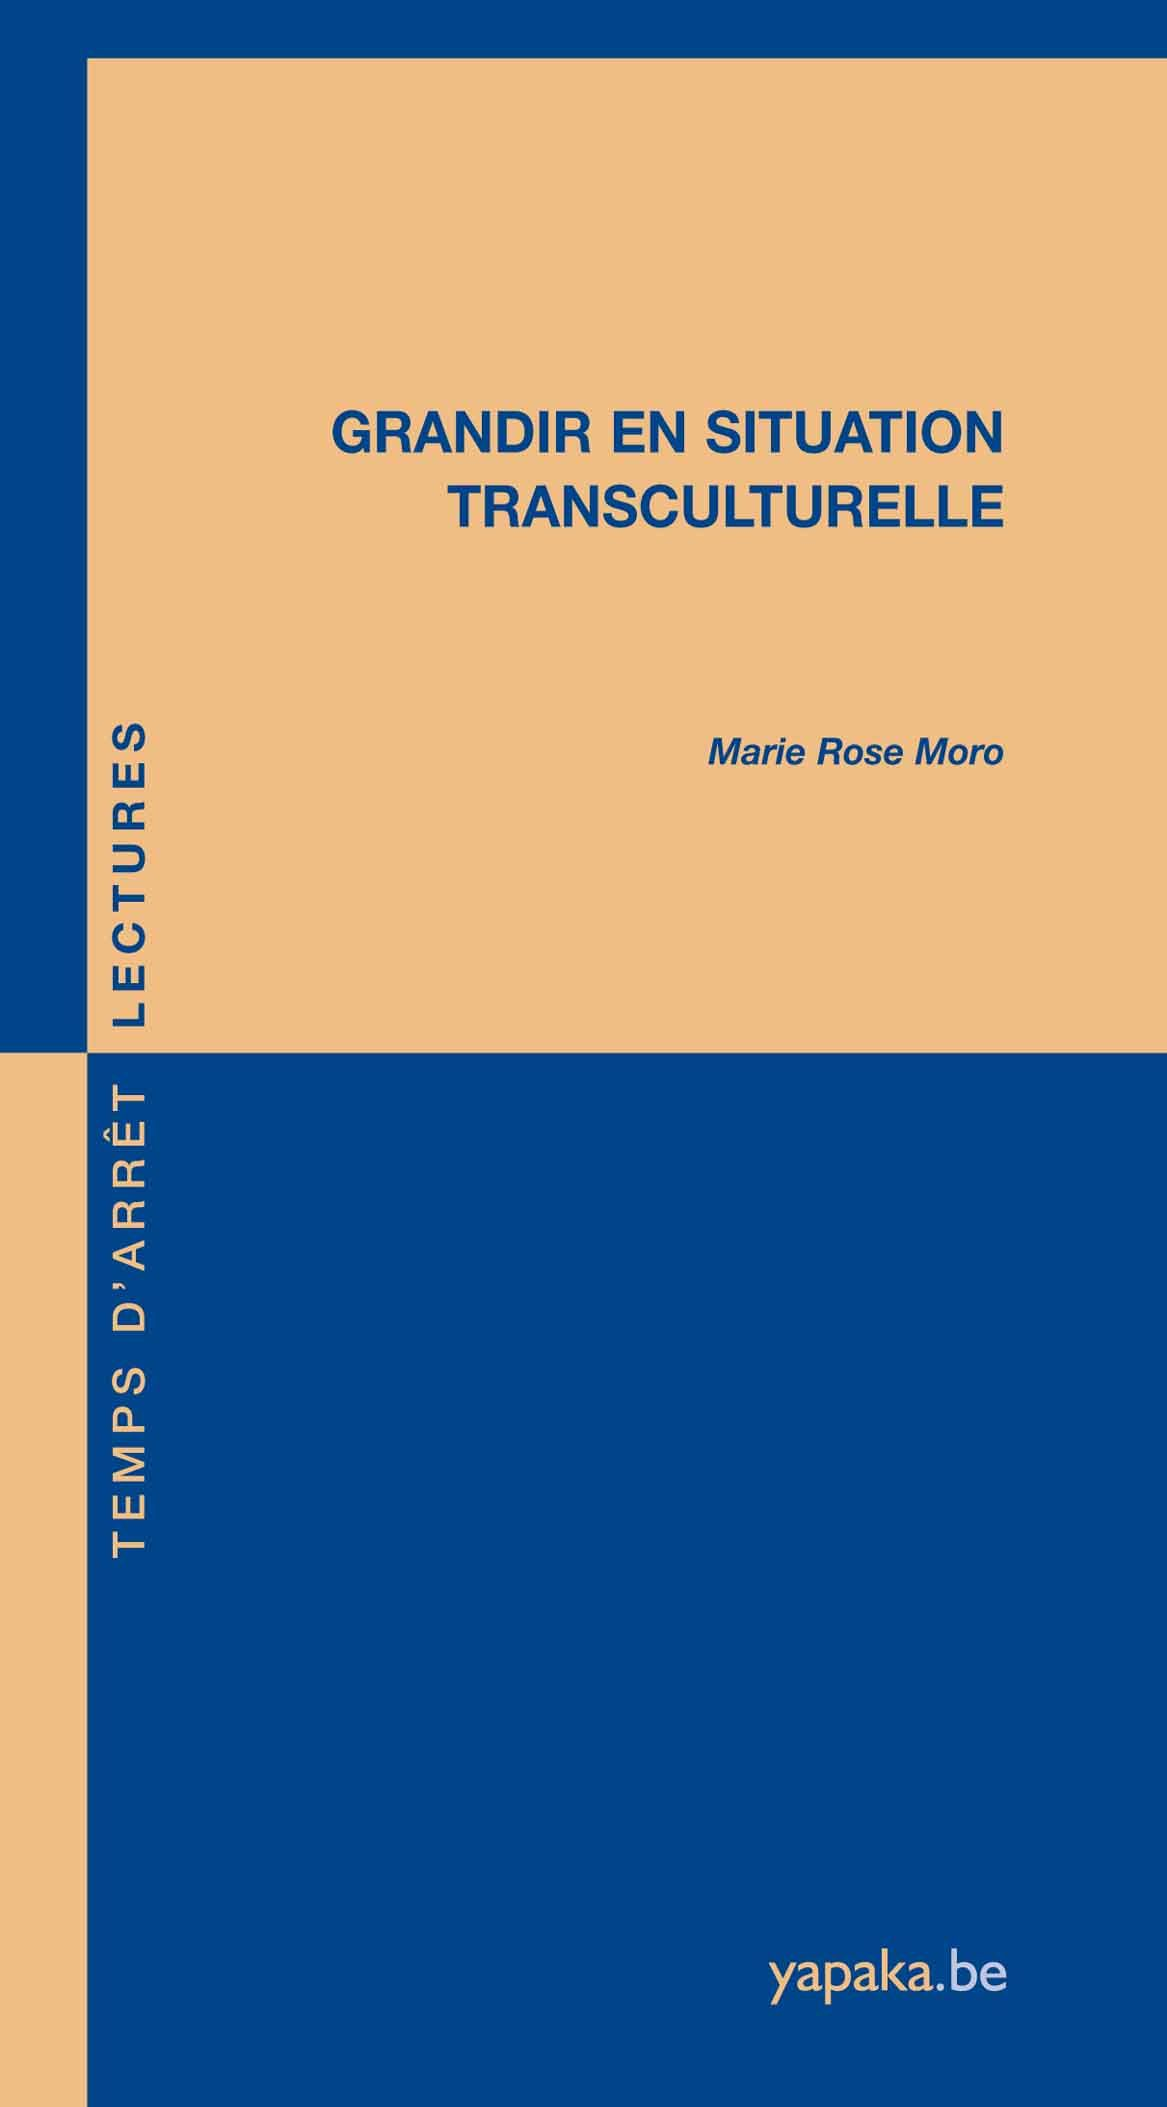 Livre Grandir En Situation Transculturelle Yapaka